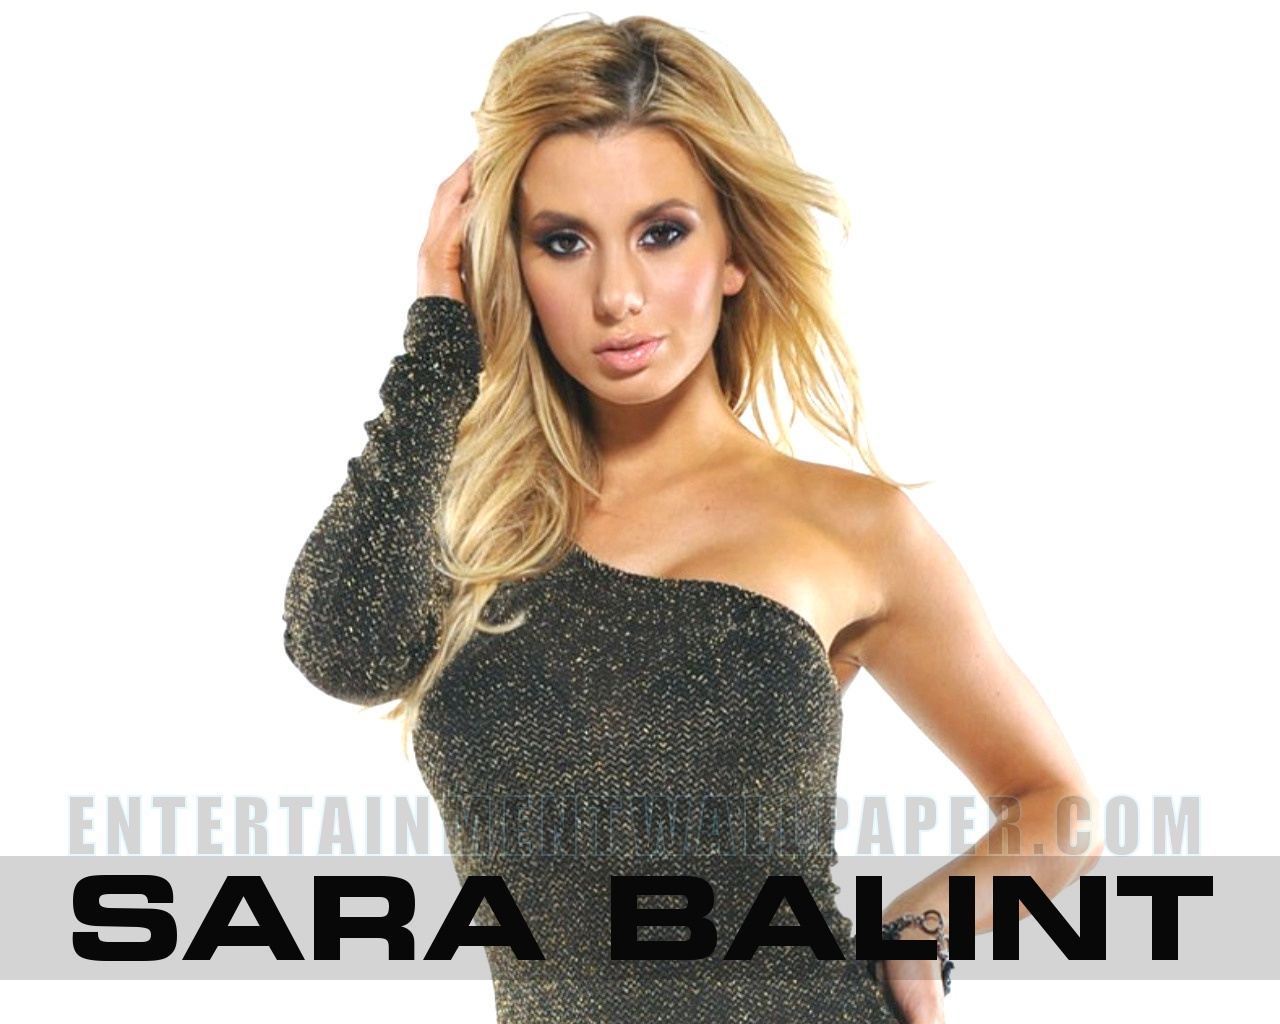 1280x1024 > Sara Balint Wallpapers